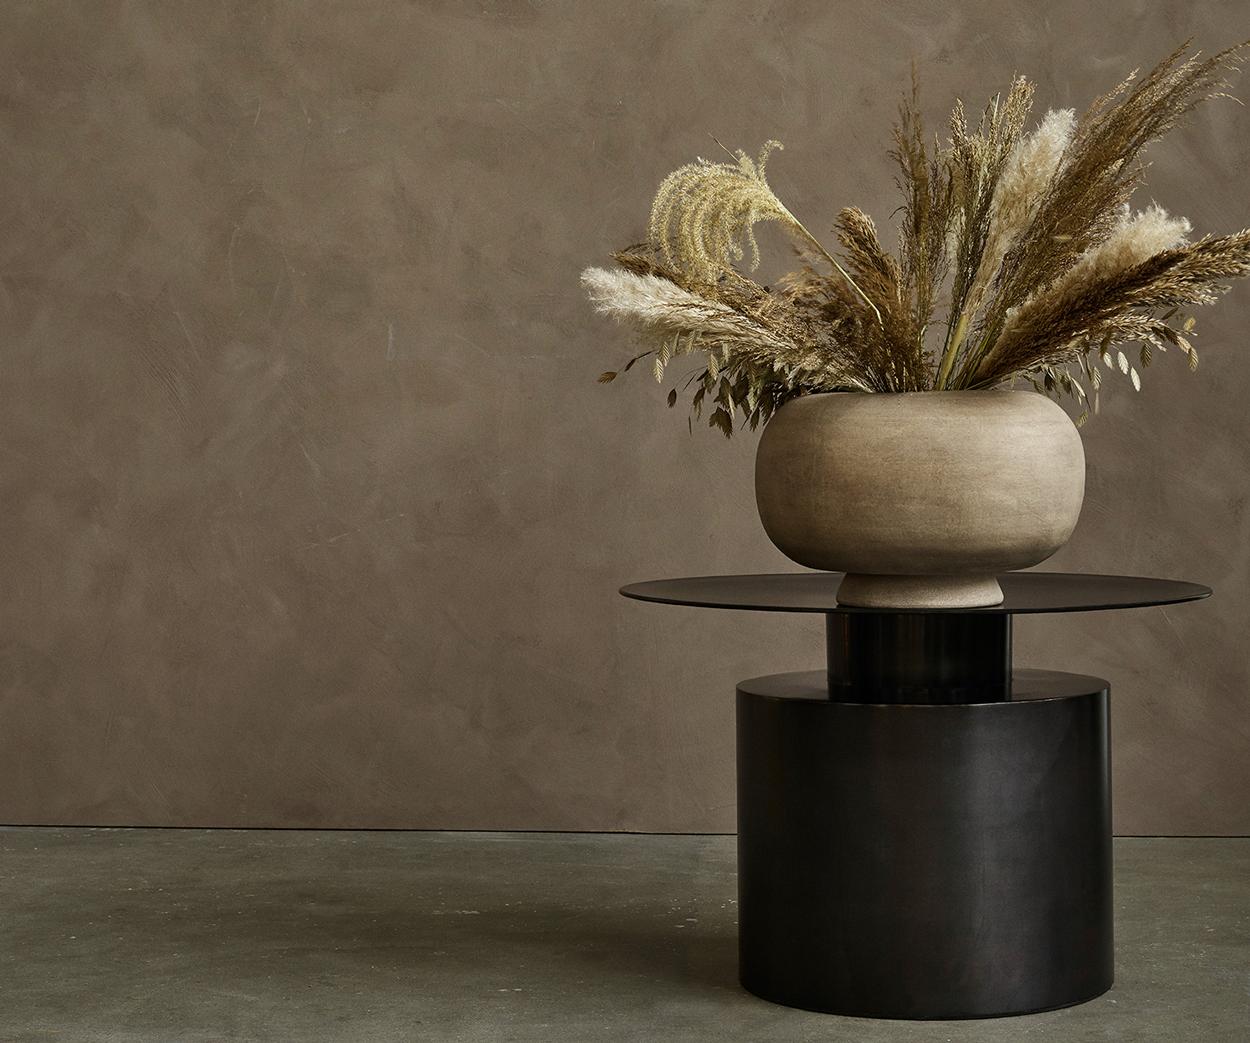 101 Copenhagen Pillar Coffee Table Low Burned Black With Flower